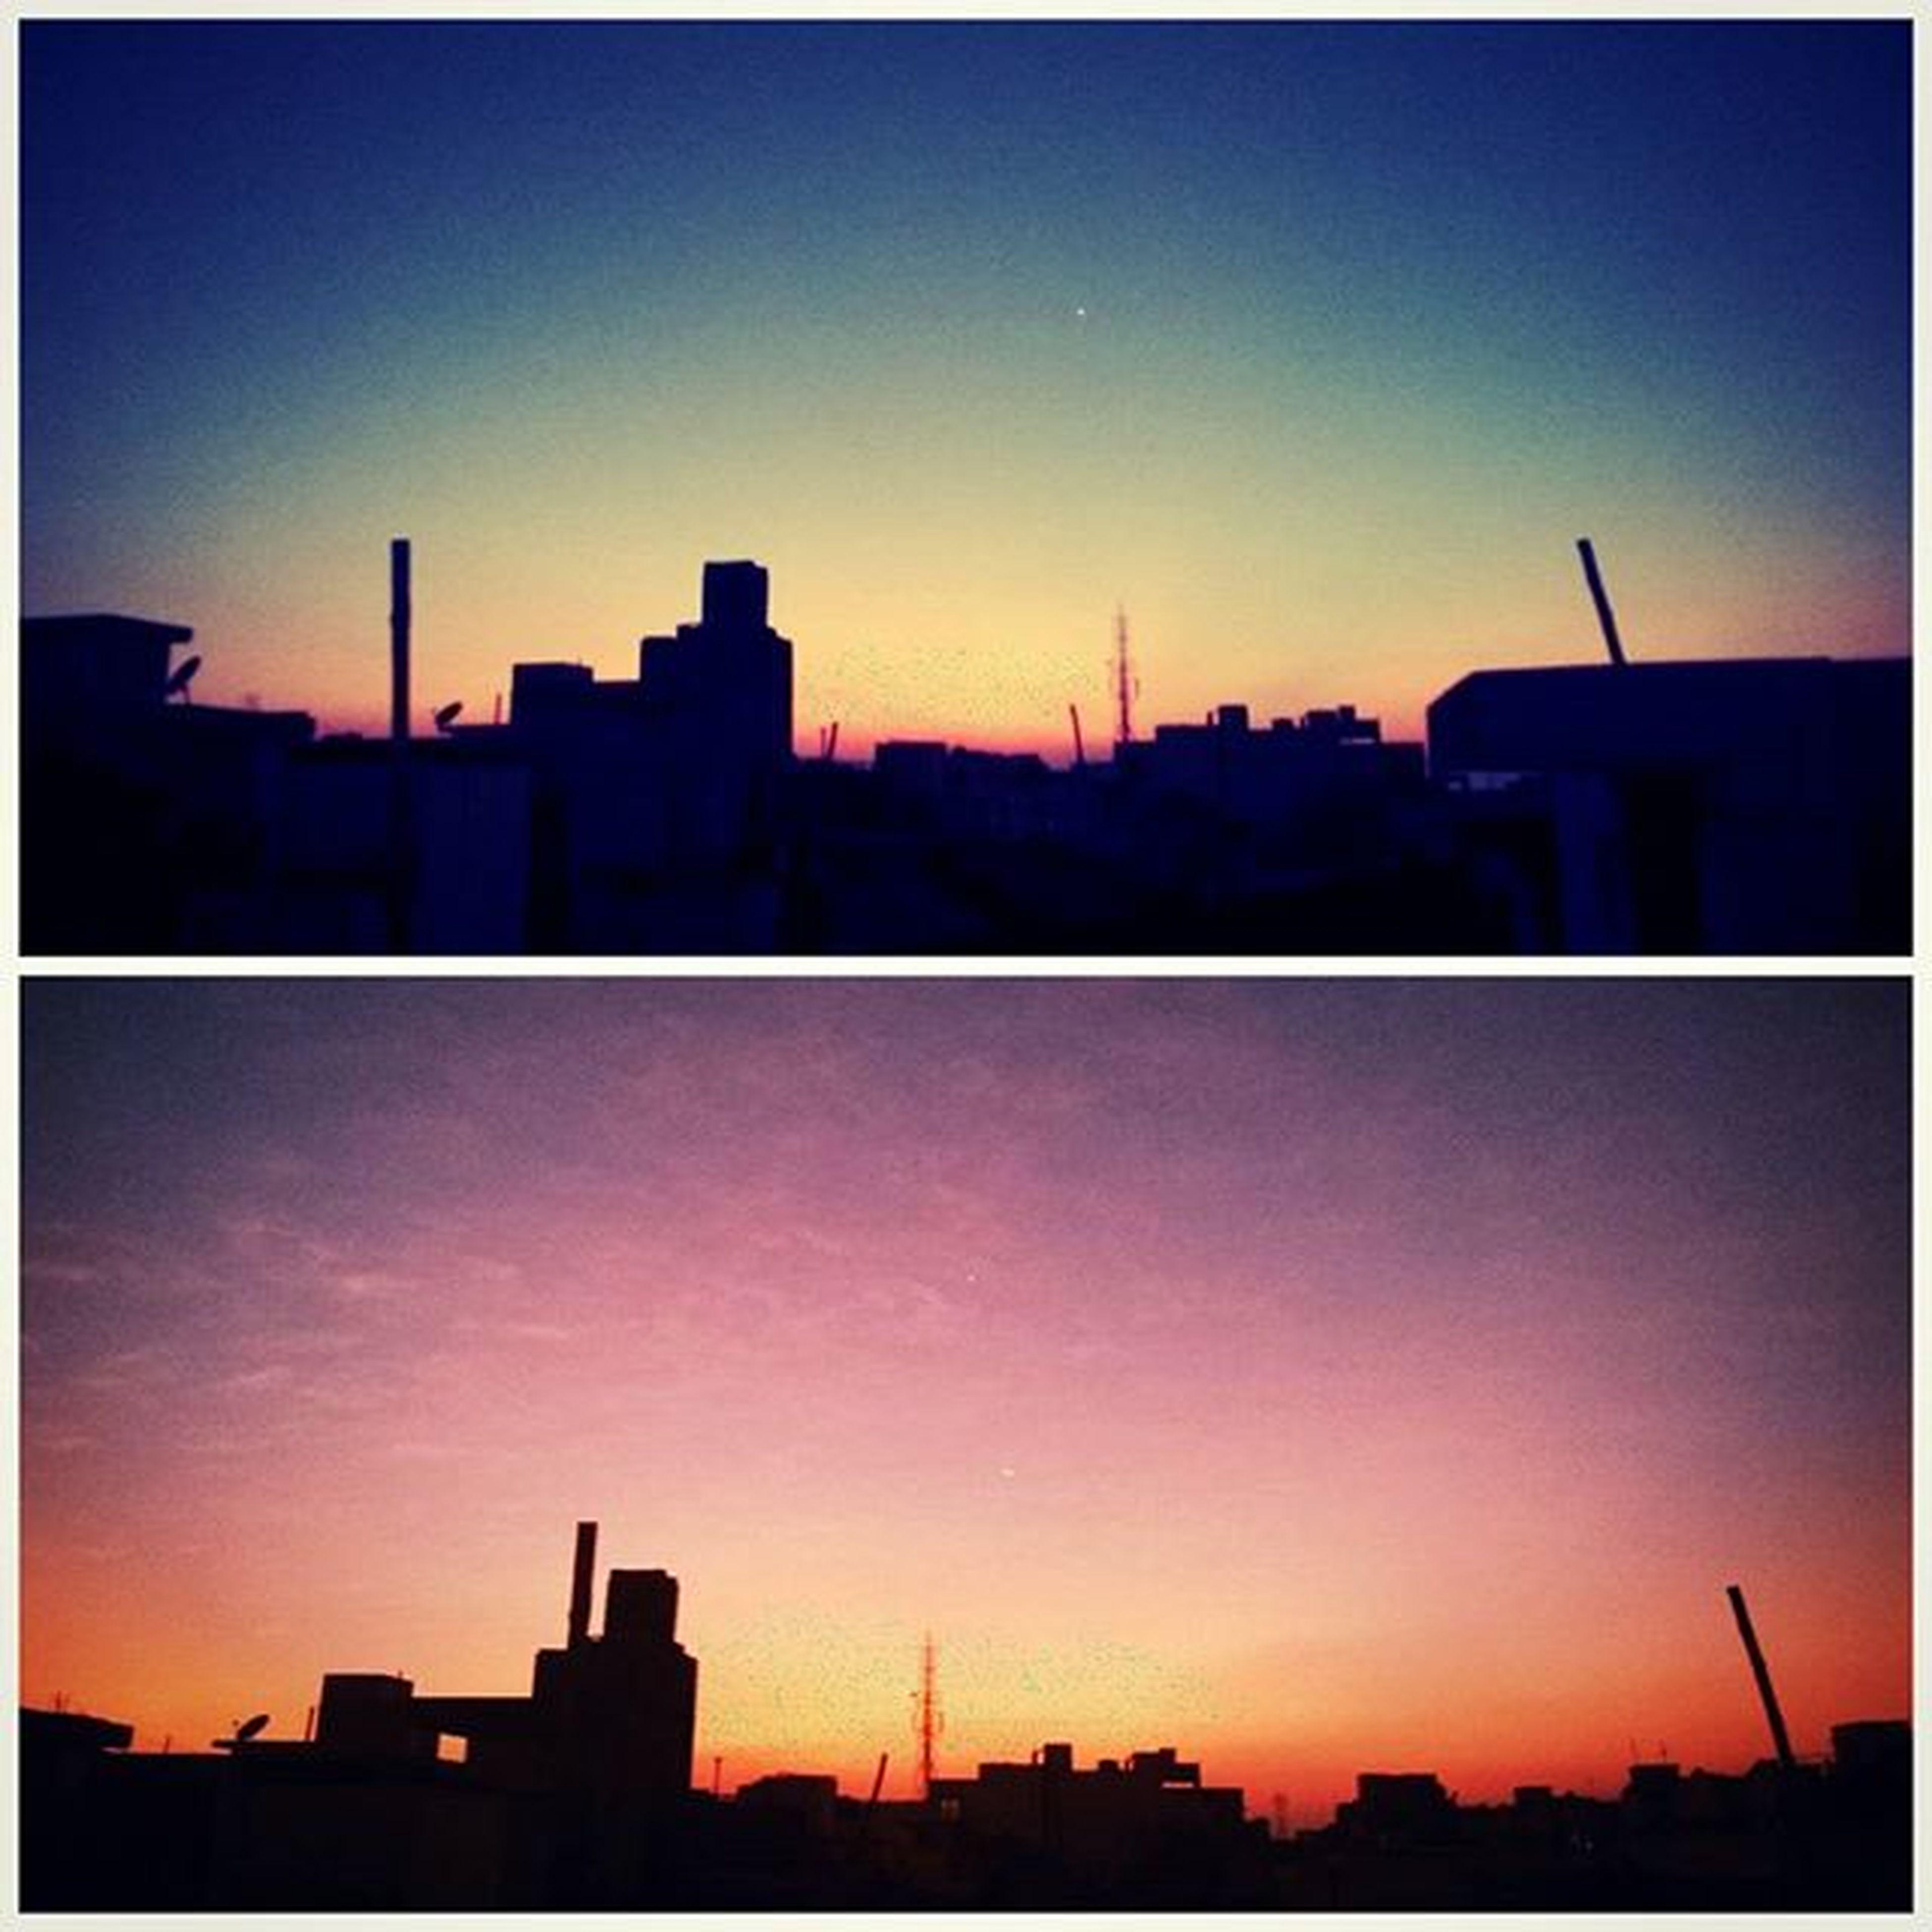 sunset, silhouette, building exterior, architecture, built structure, city, orange color, transfer print, clear sky, copy space, skyline, cityscape, auto post production filter, sun, outline, sky, dusk, skyscraper, tower, dark